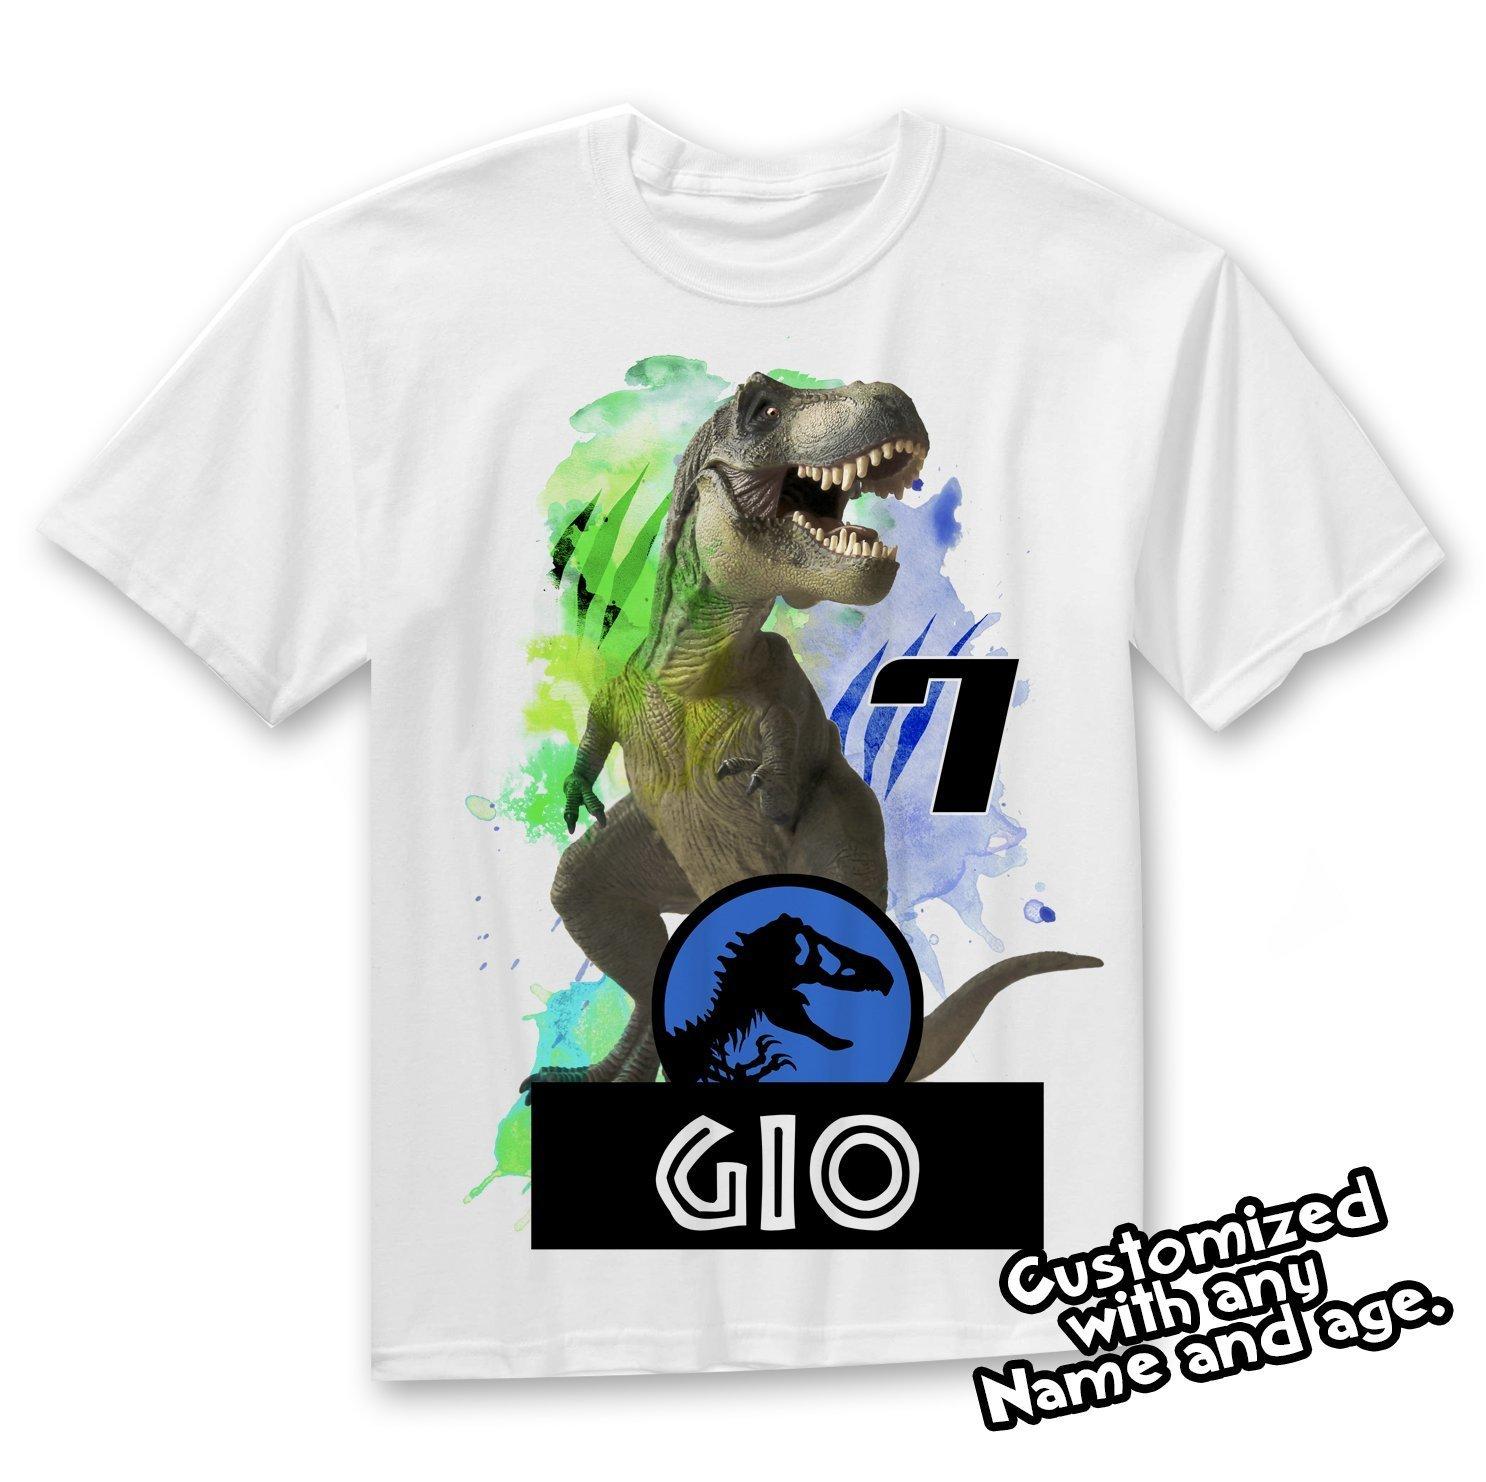 Jurassic World Dinosaur Personalized Birthday Shirt Party Favor, Jurassic Park Birthday shirt